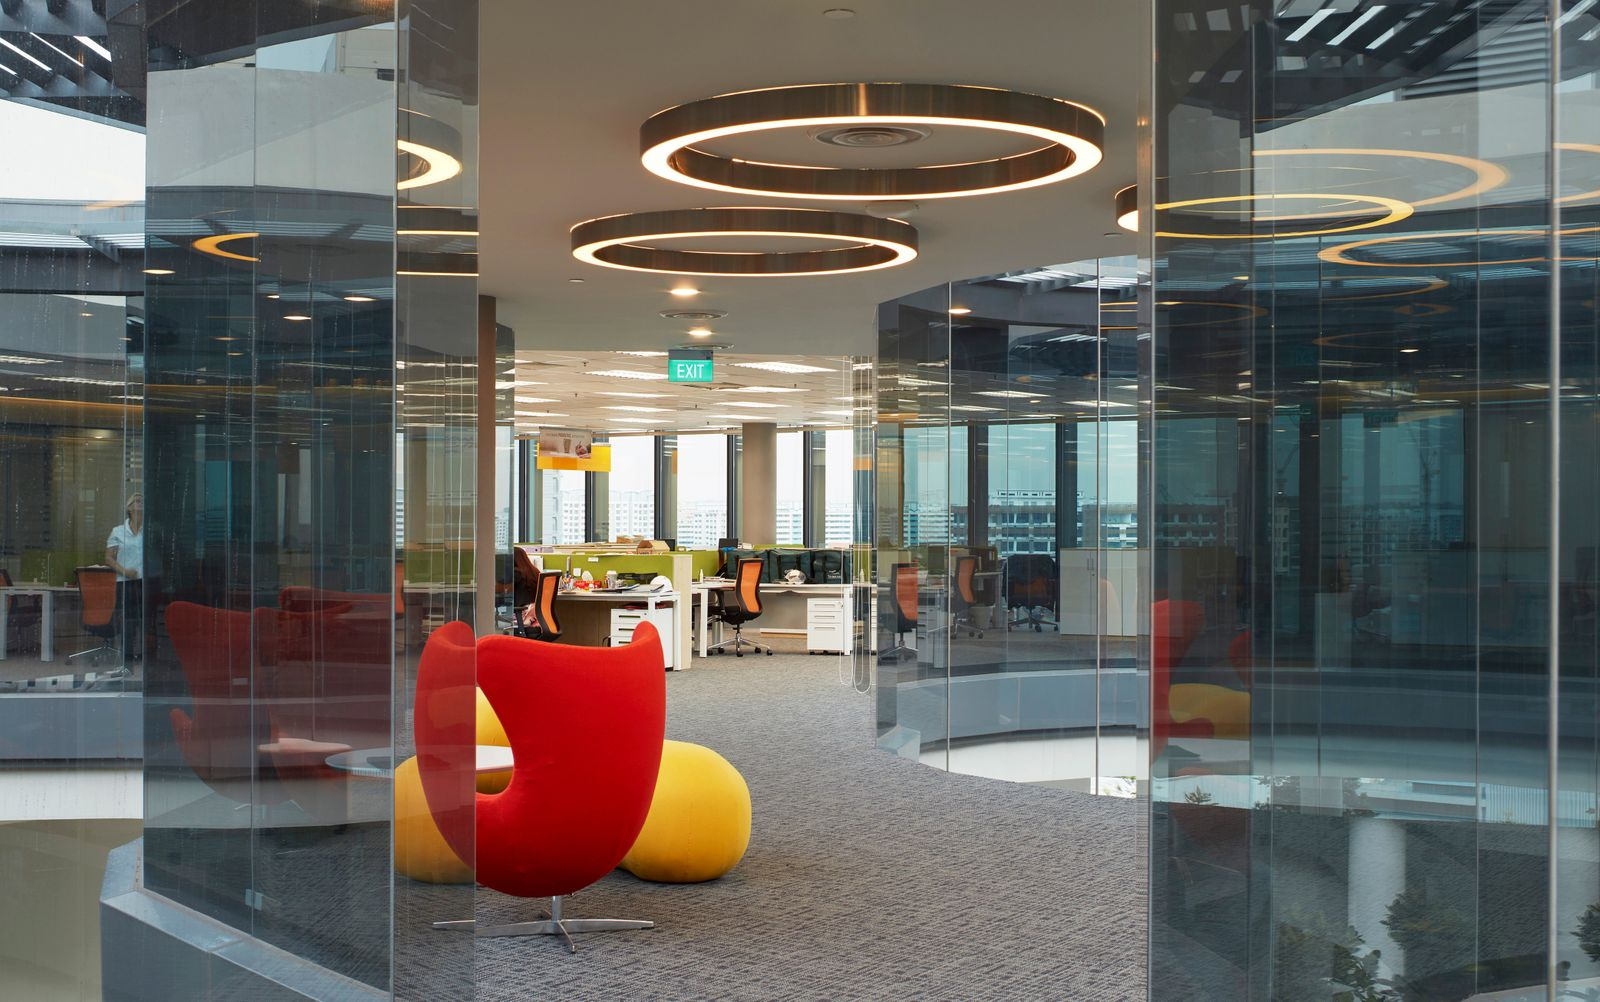 SELECT Group Headquarters, Singapore, Singapore. Architect: Kay Ngee Tan, 2016.